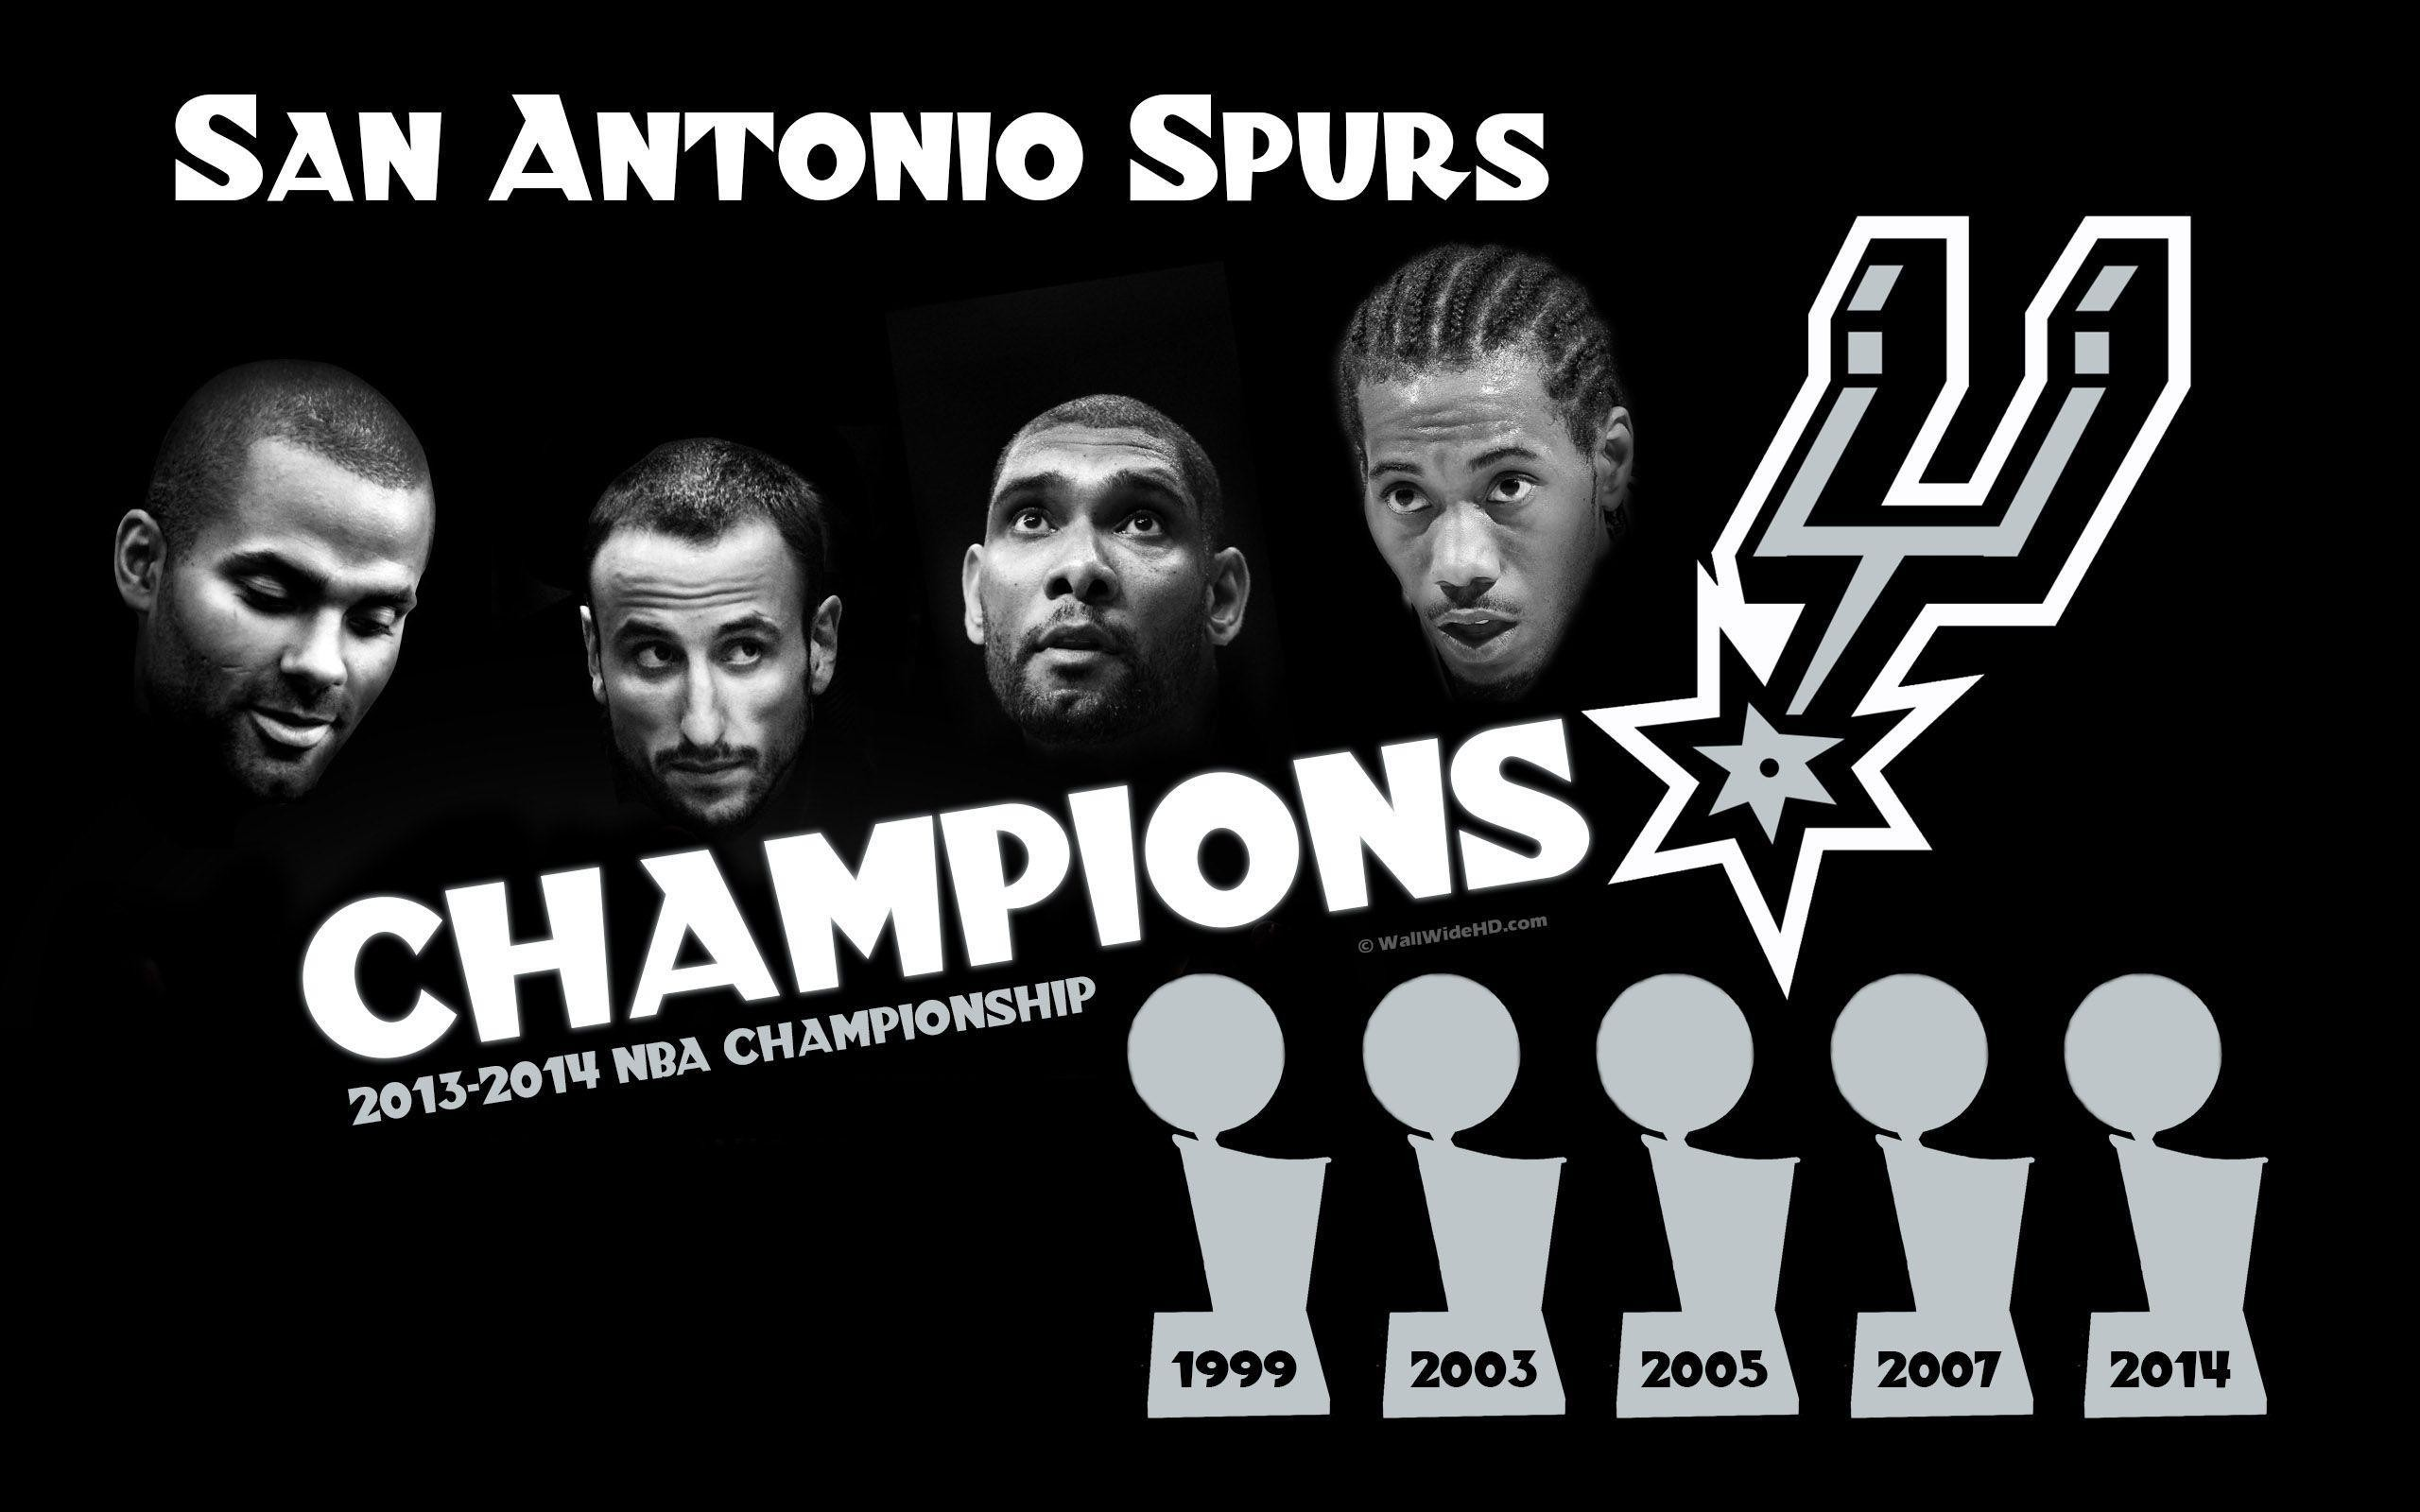 San Antonio Spurs Wallpapers 66 Images